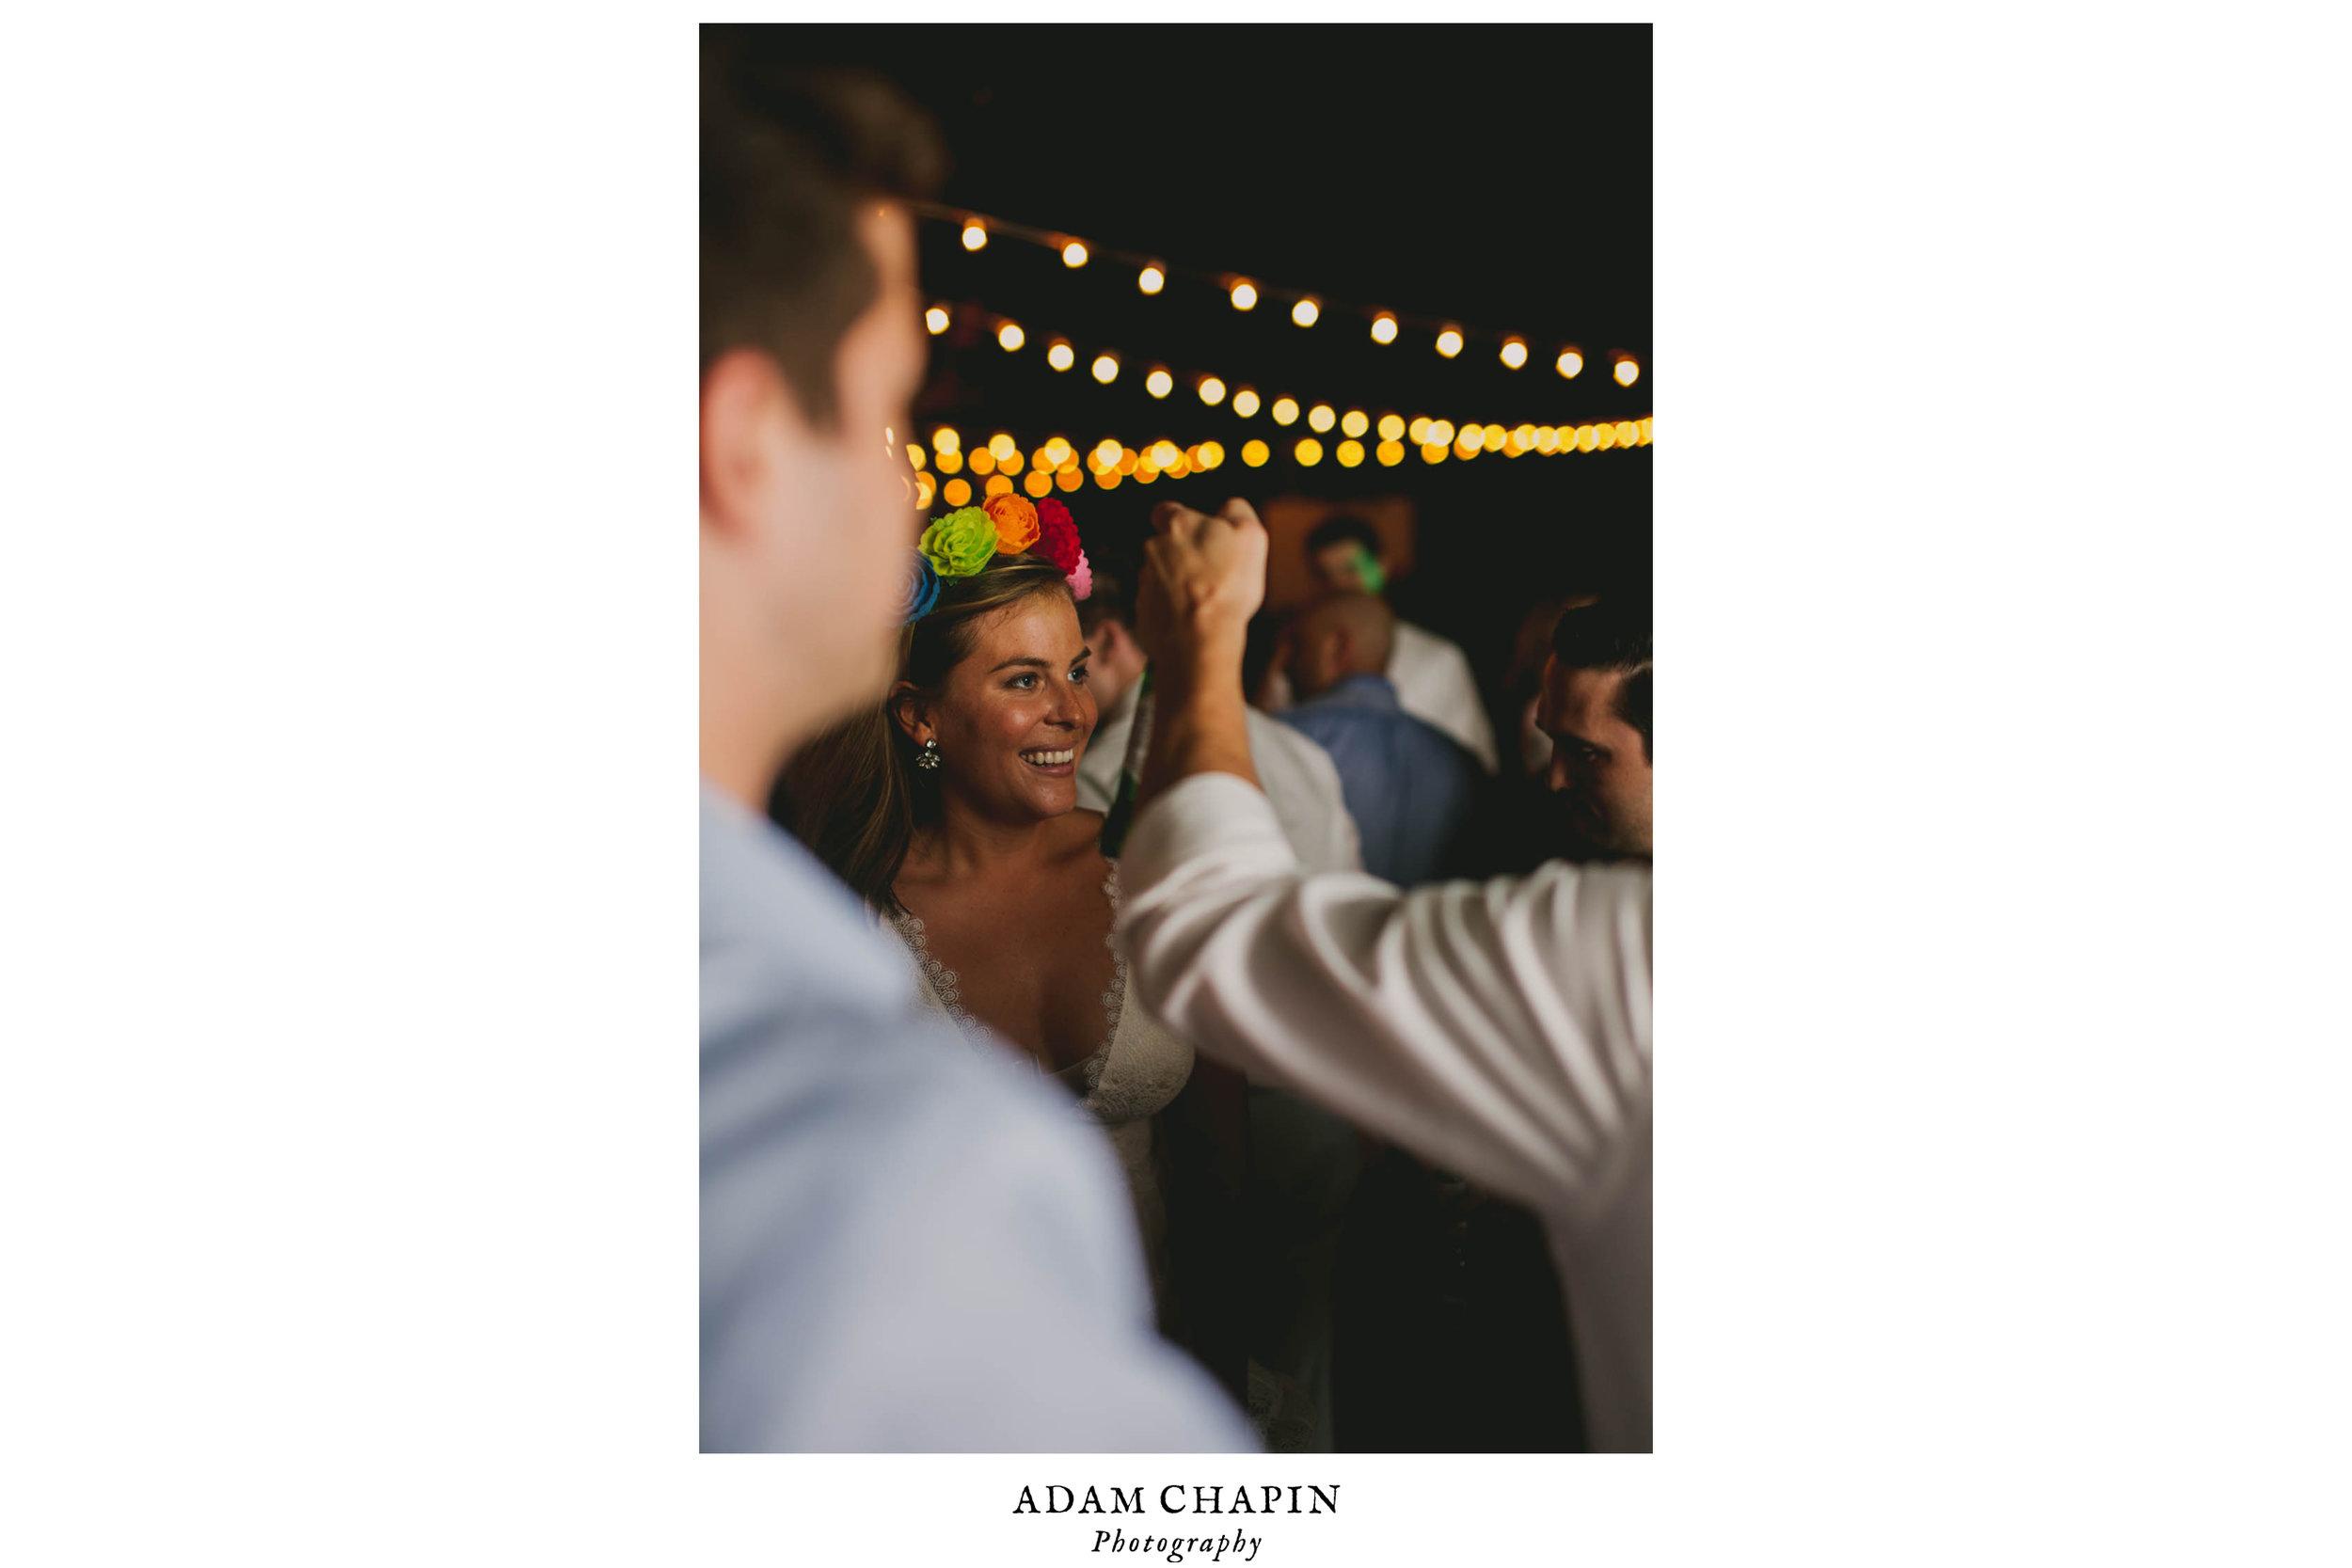 mims-house-wedding-reception-dancing-bride.jpg